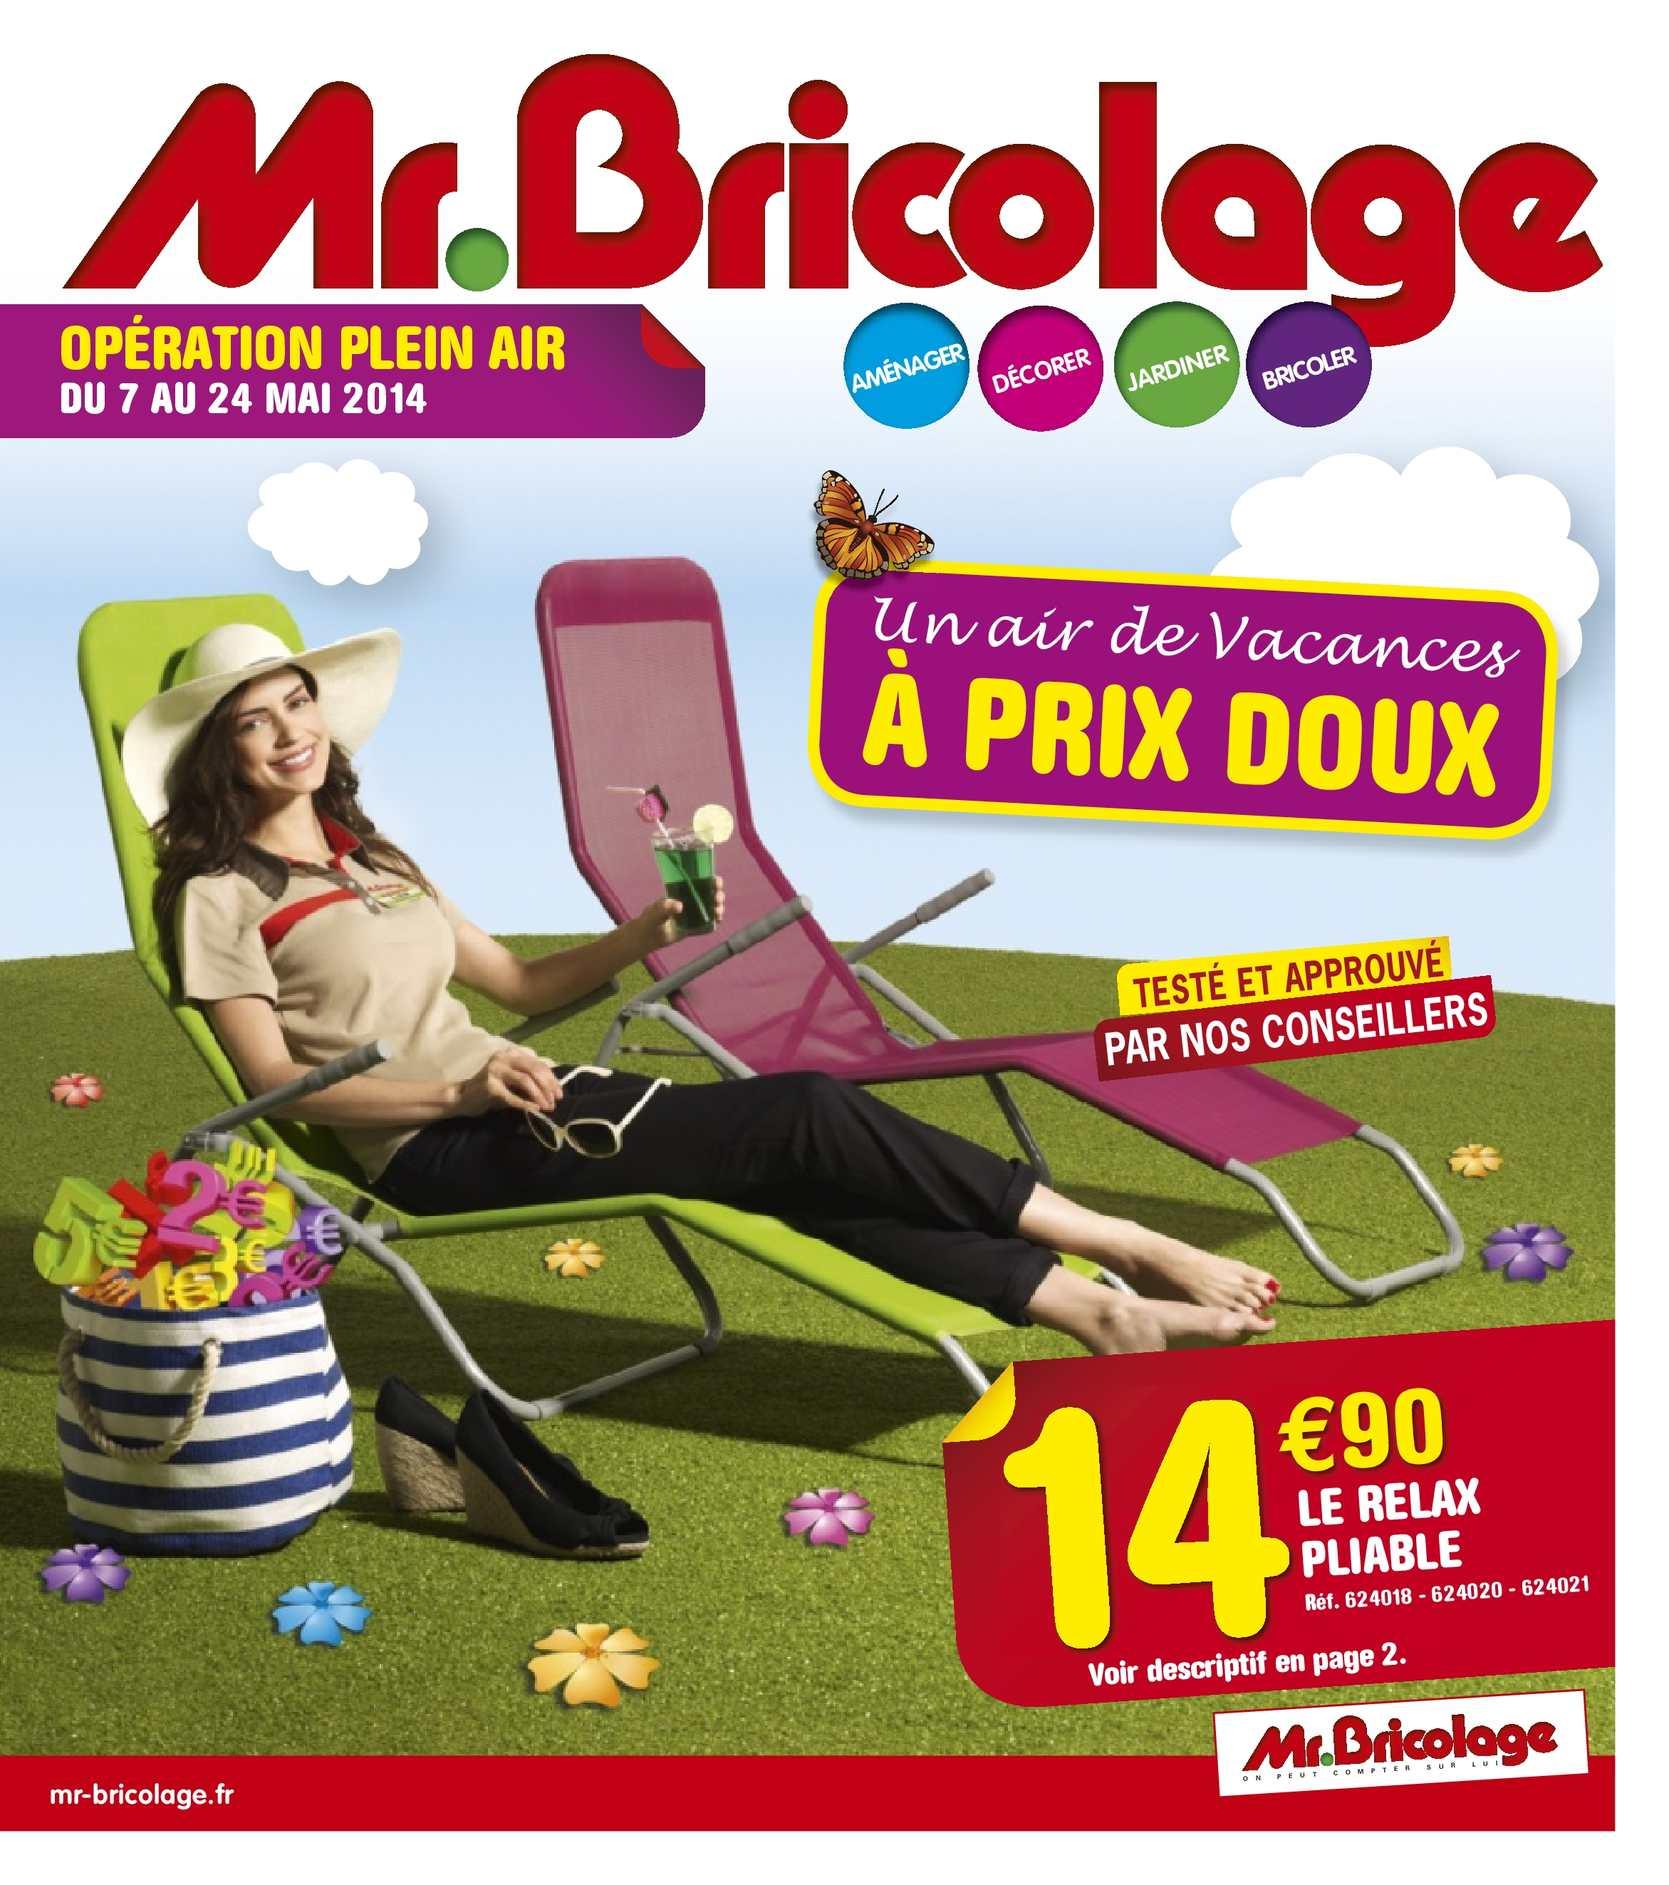 Calam o catalogue mr bricolage plein air 2014 4 pages - Mr bricolage moulins ...